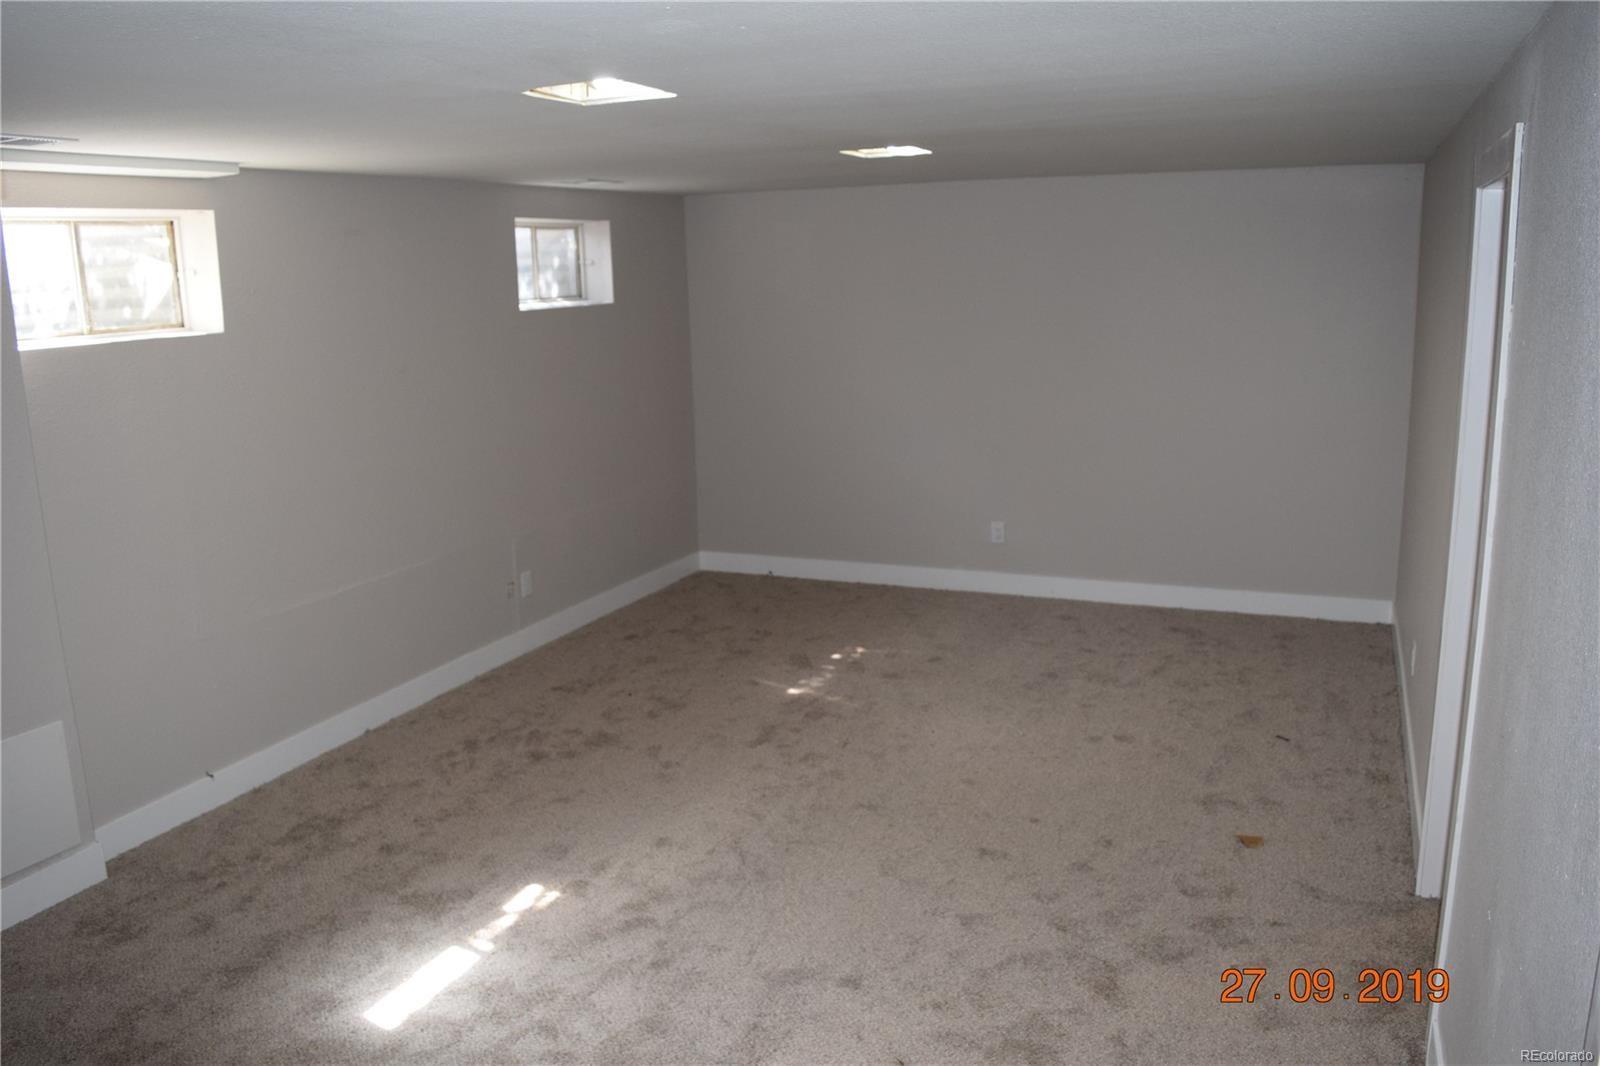 MLS# 9616472 - 19 - 8026 W Calhoun Place, Littleton, CO 80123